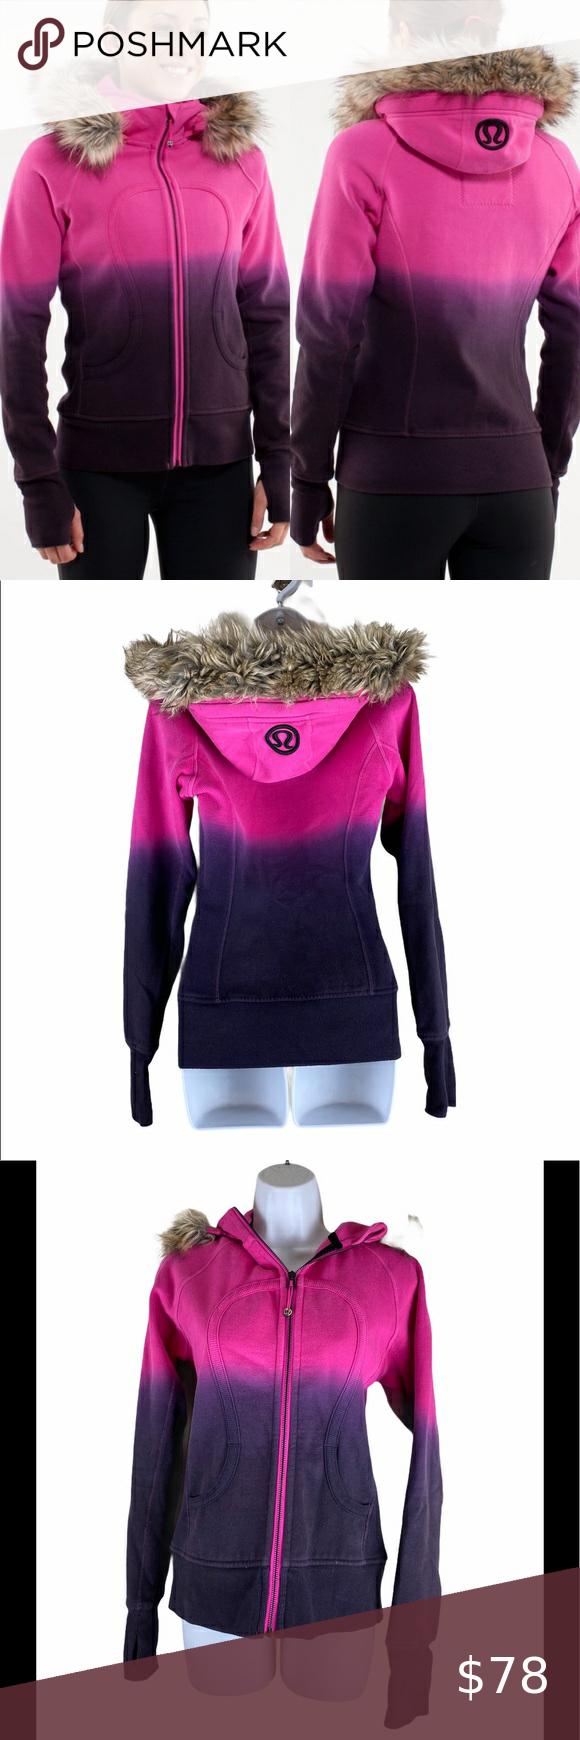 Lululemon Limited Edition Scuba Hoodie Tie Dye 6 Clothes Design Hoodies Fashion [ 1740 x 580 Pixel ]